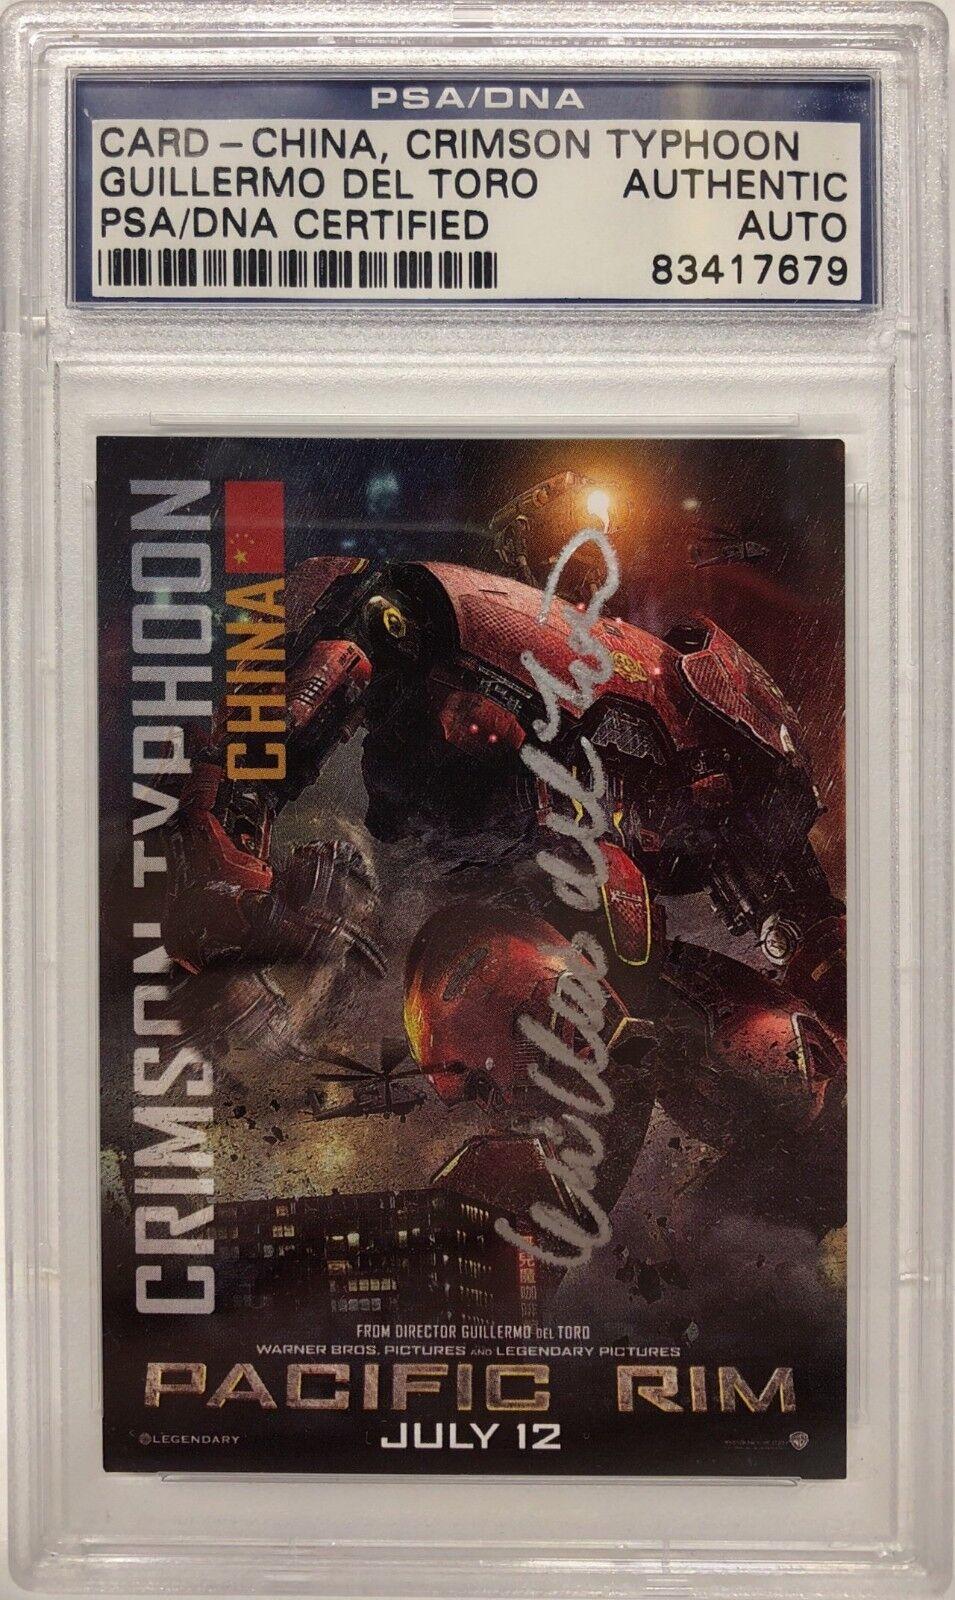 Guillermo Del Toro Signed Pacific Rim China, Crimson Typhoon Card Slabbed PSA